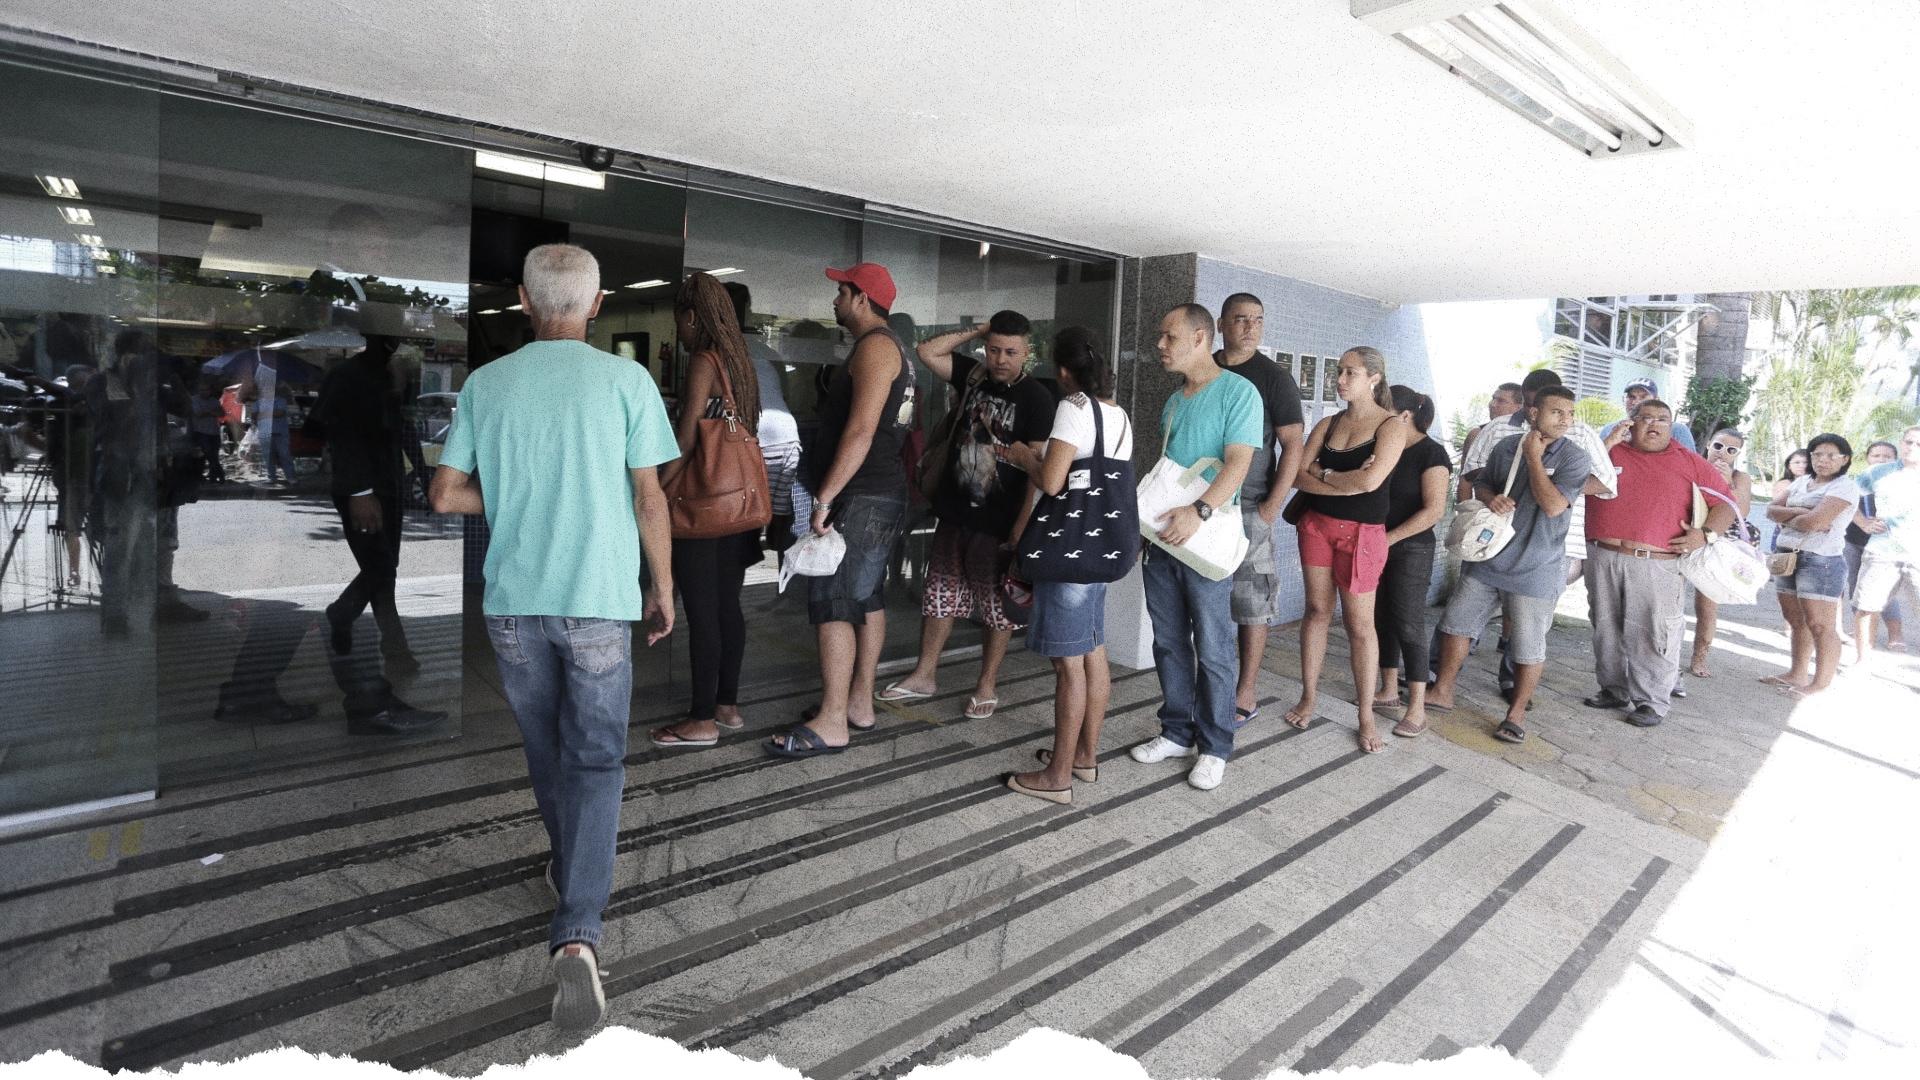 Fabiano Rocha / Extra / Agência O Globo